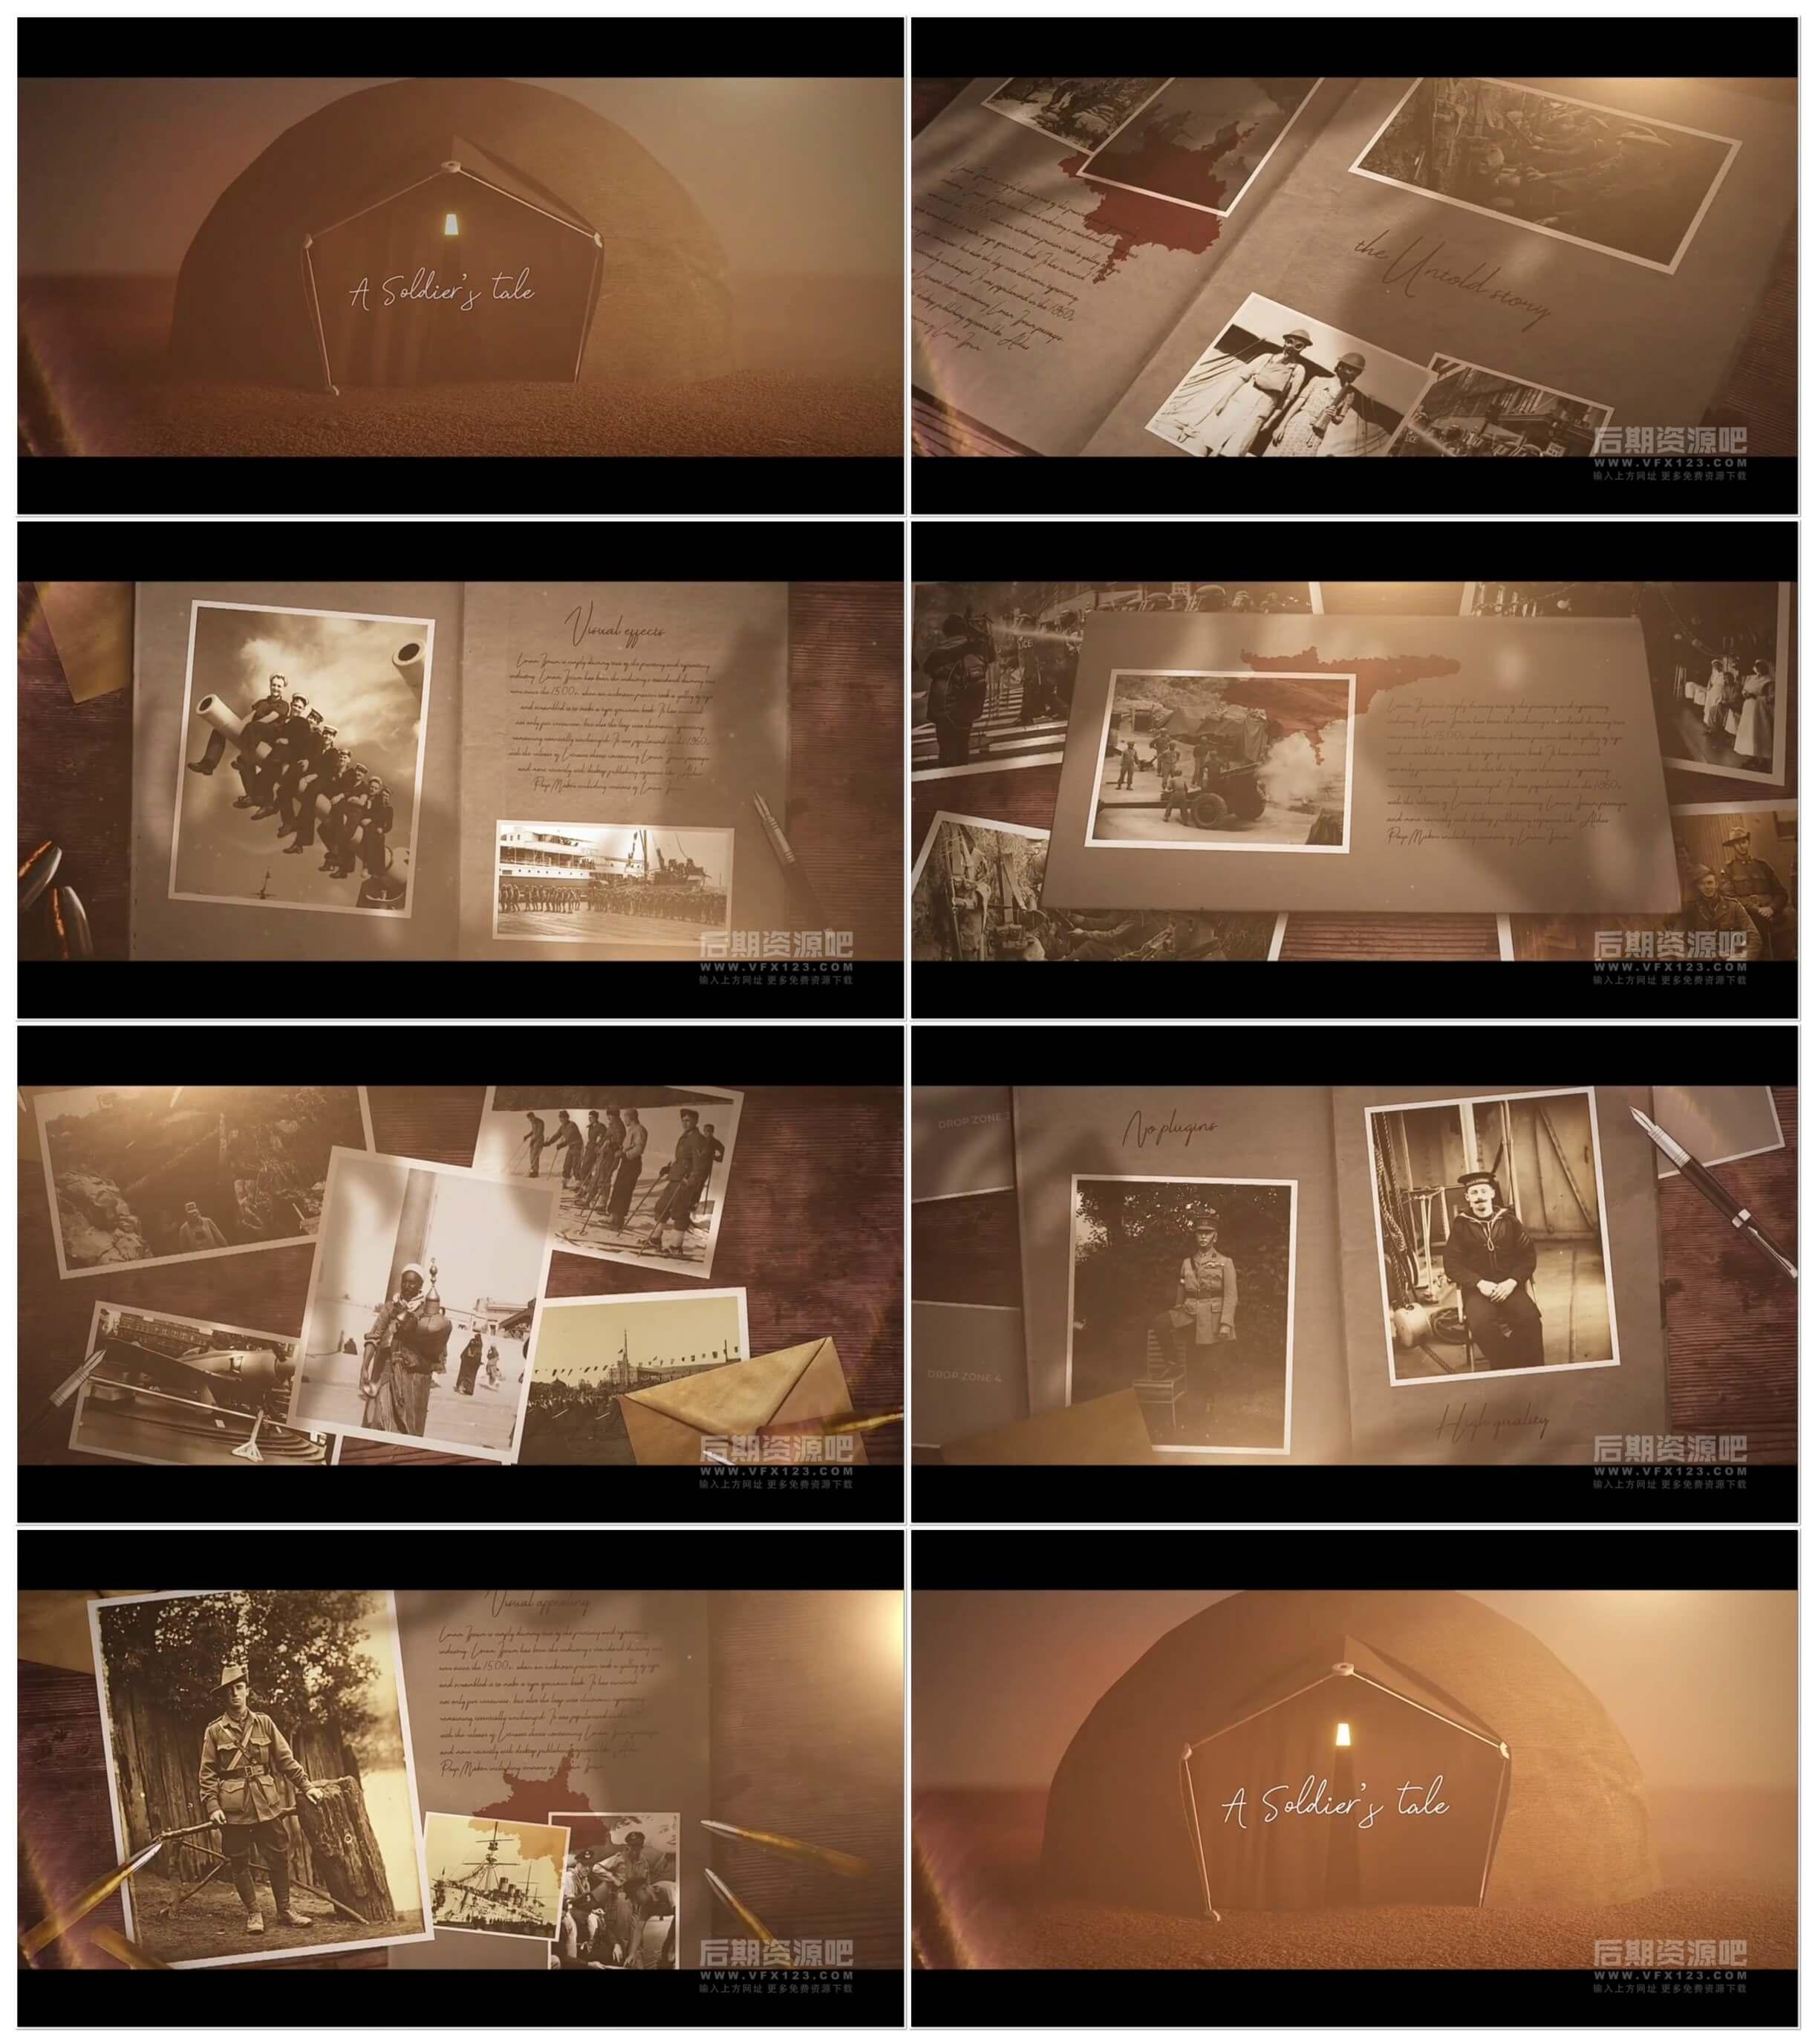 fcpx插件 沧桑历史回忆故事开场图文展示模板 12分镜 A Soldiers Tale